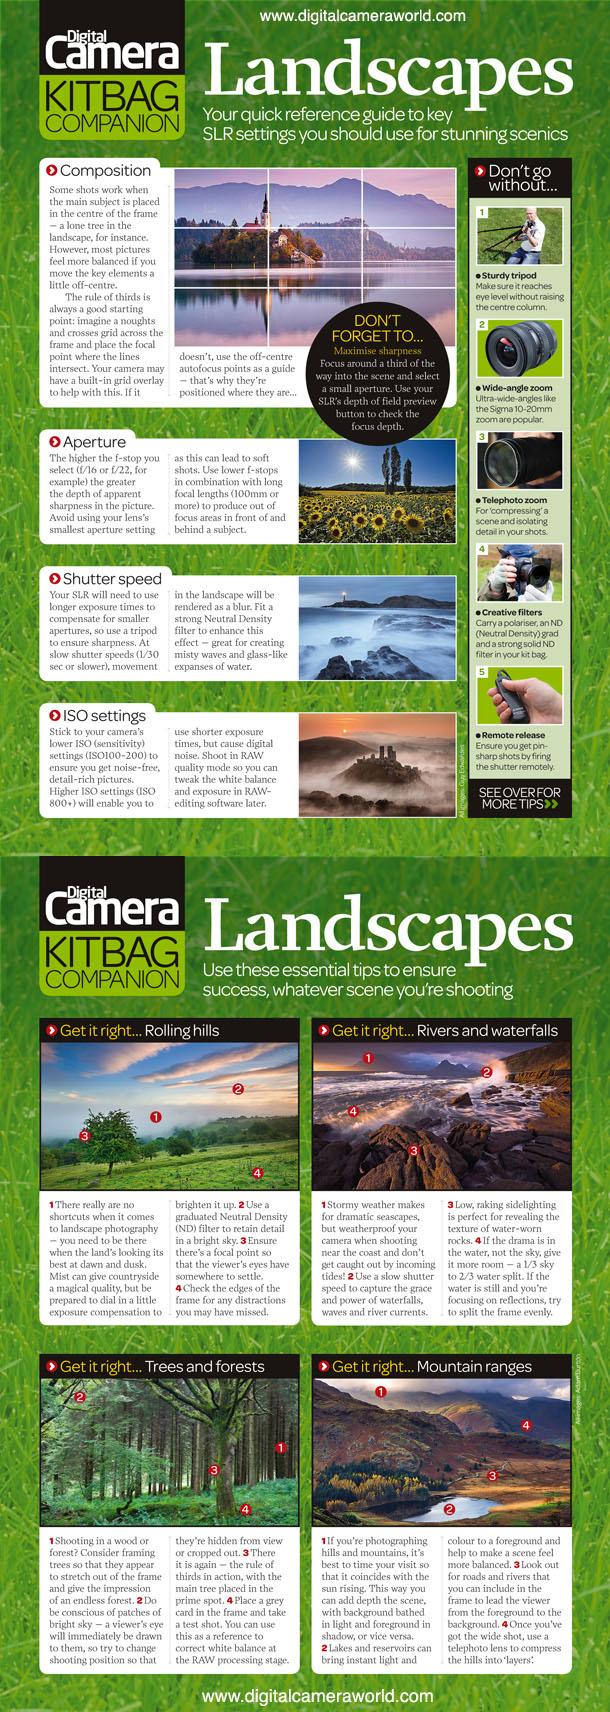 fotografiar paisajes